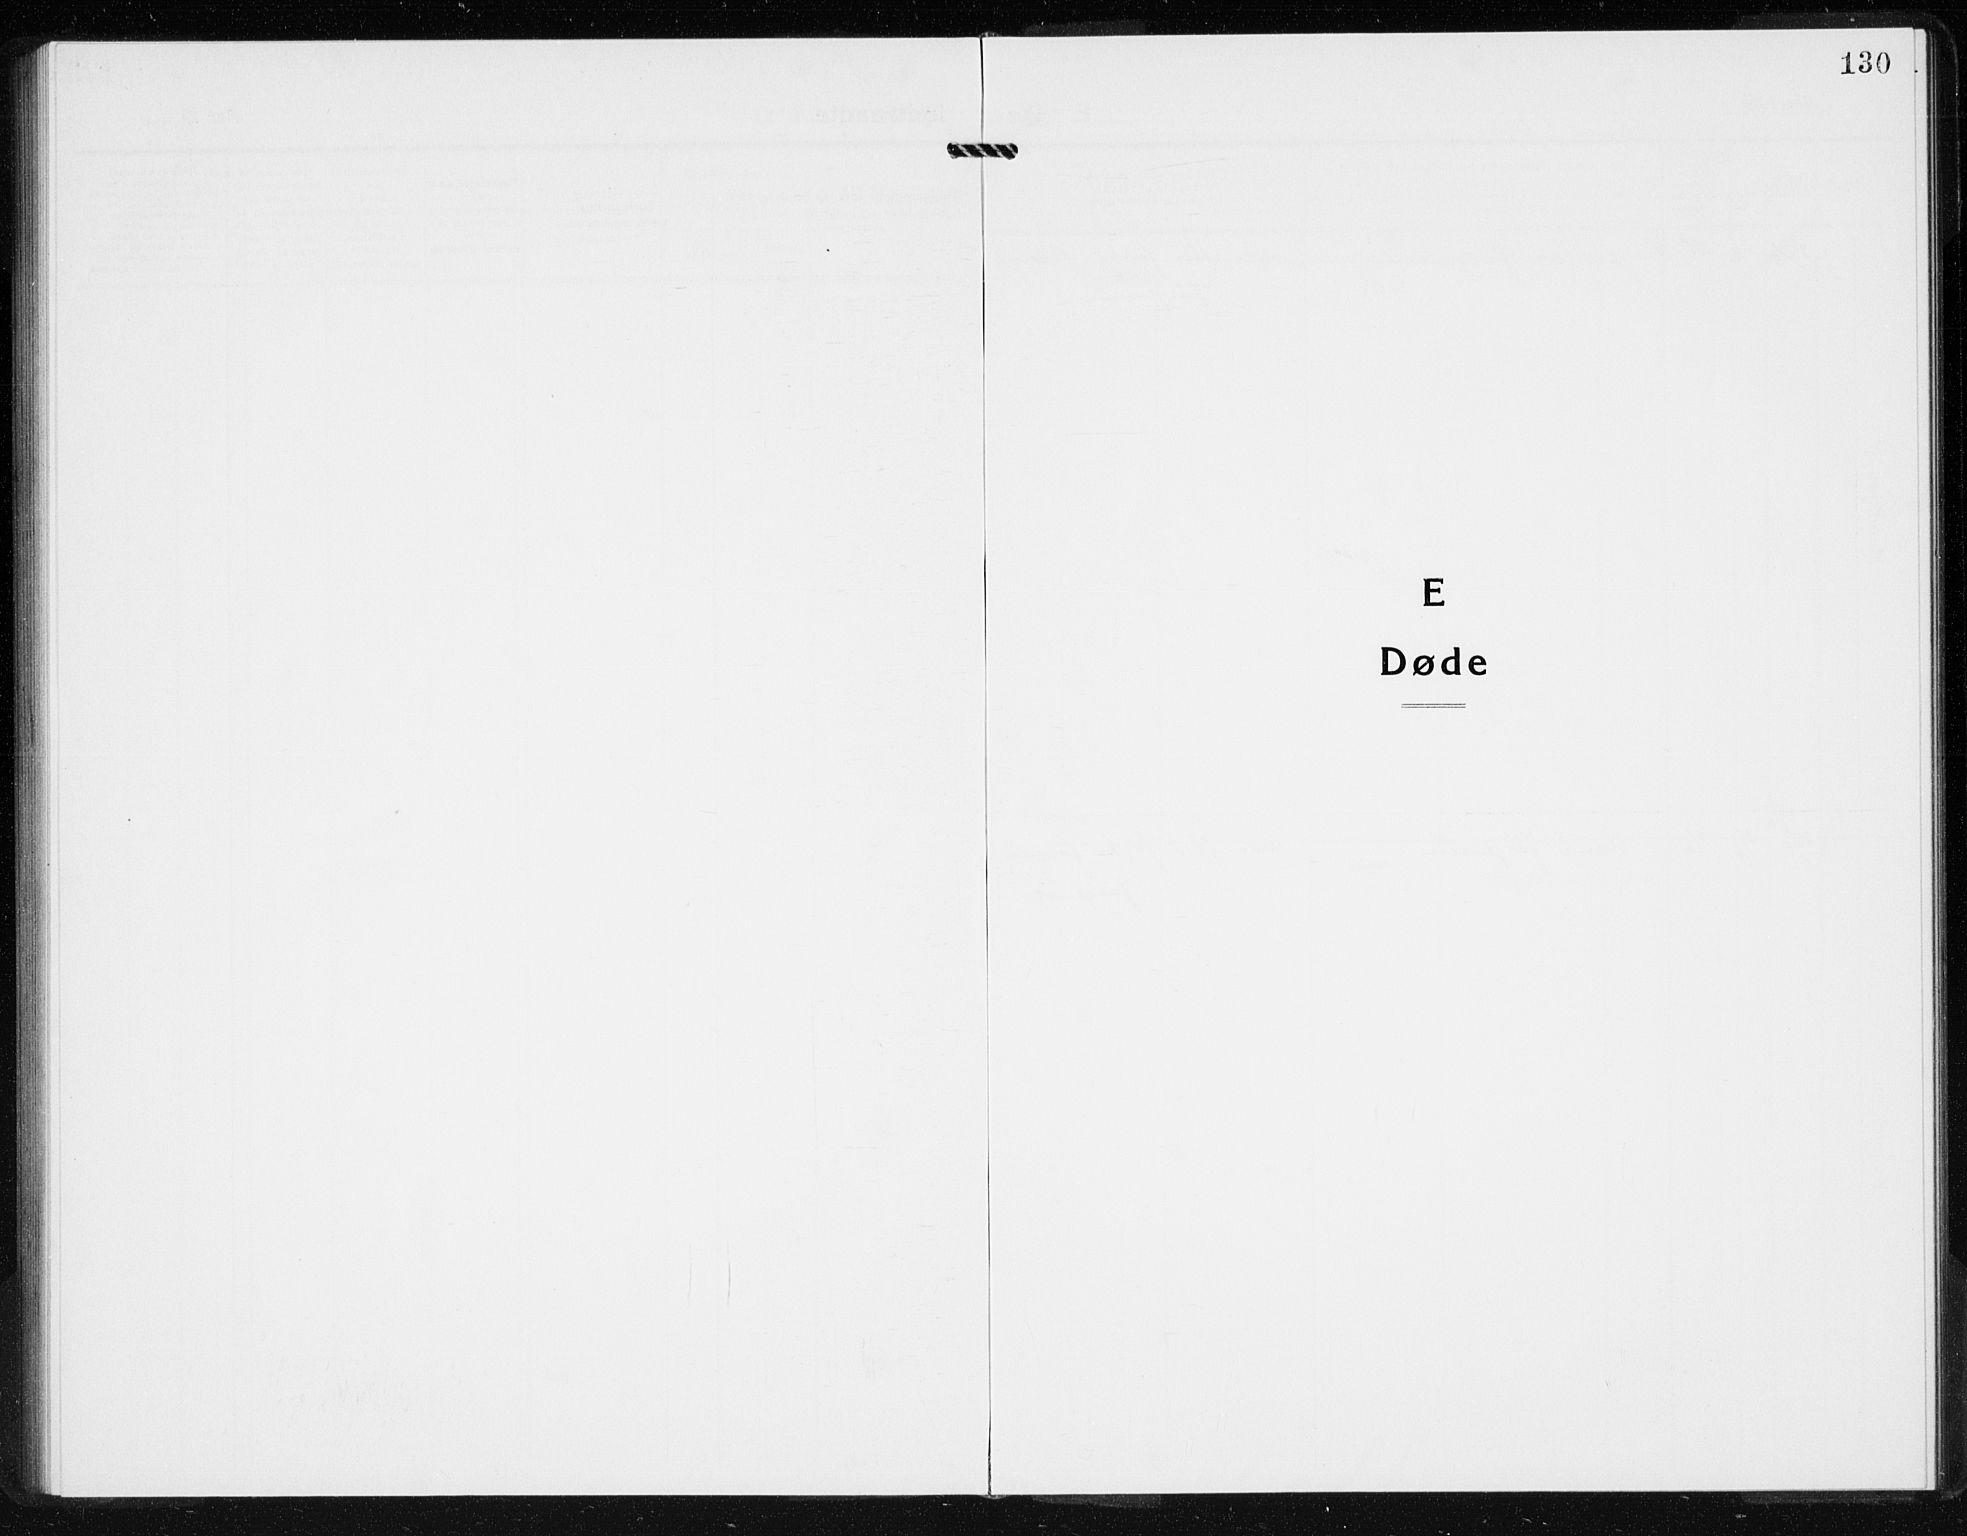 SAKO, Hurum kirkebøker, G/Gb/L0001: Klokkerbok nr. II 1, 1917-1934, s. 130